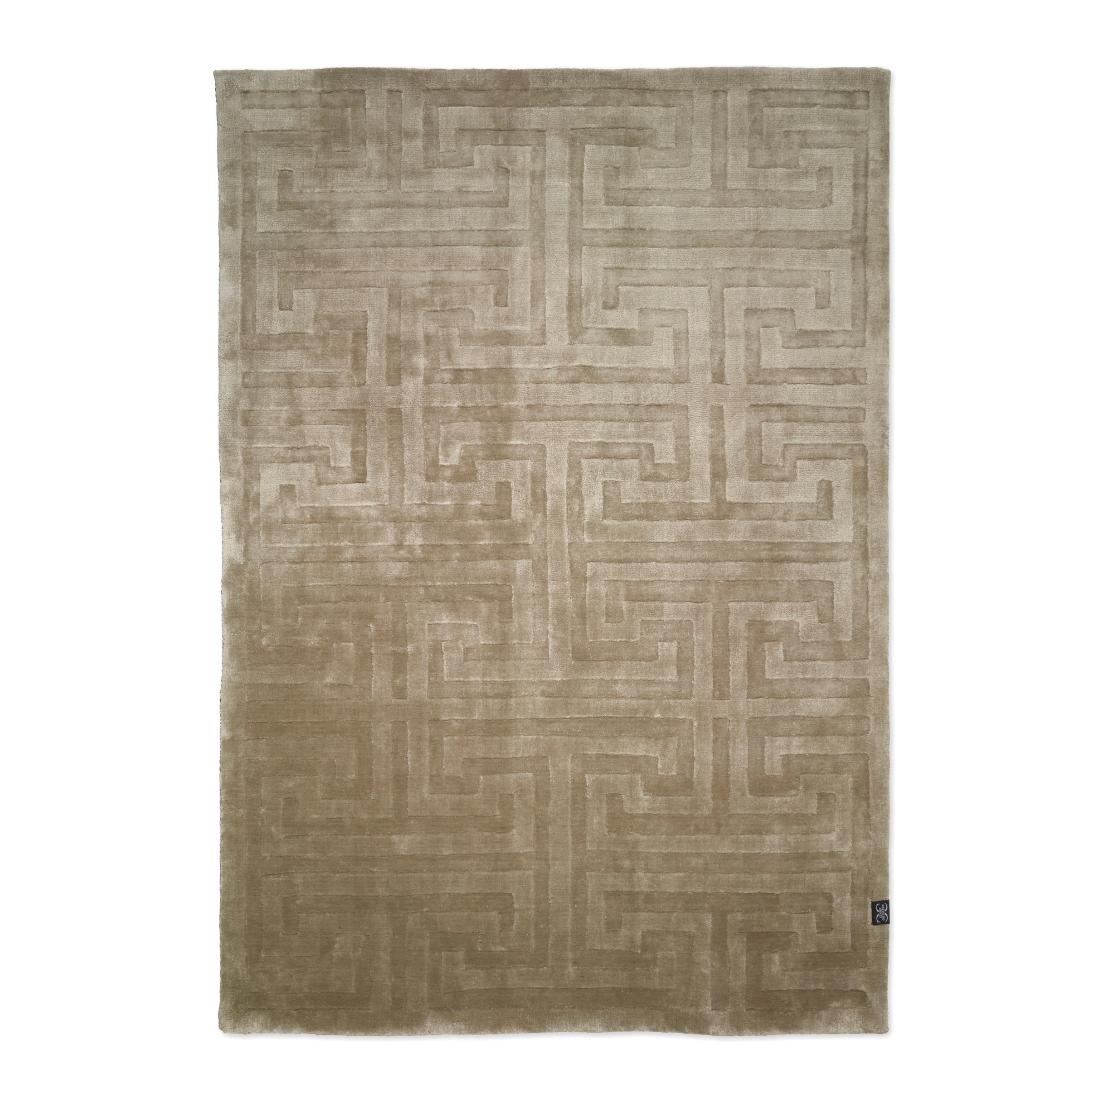 Viskosmatta KEY taupe 200 x 300 cm, Classic Collection